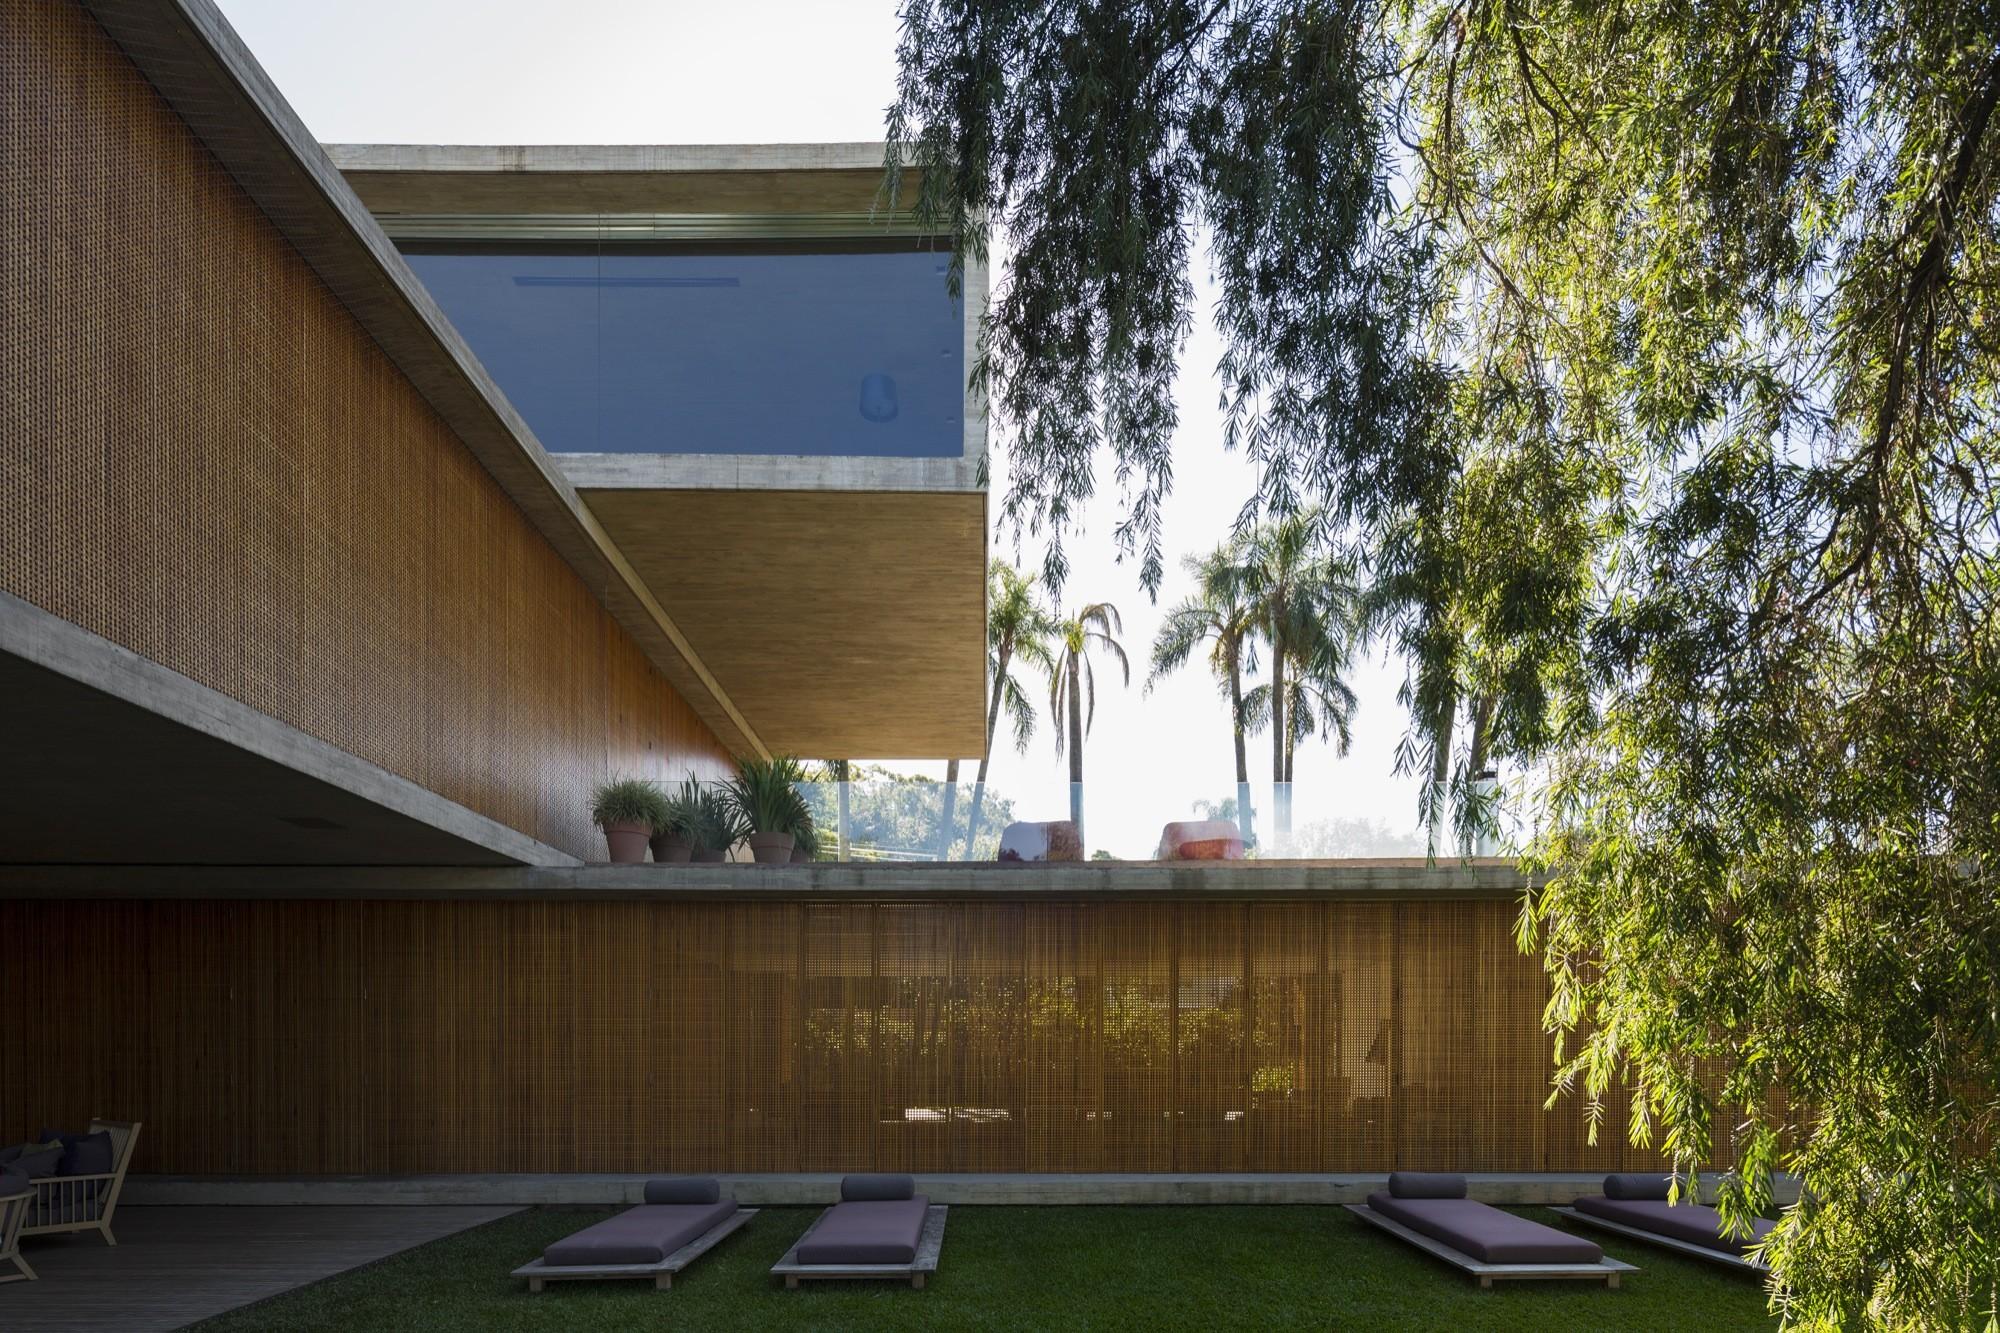 P House the p house / studio mk27 - marcio kogan + lair reis | archdaily